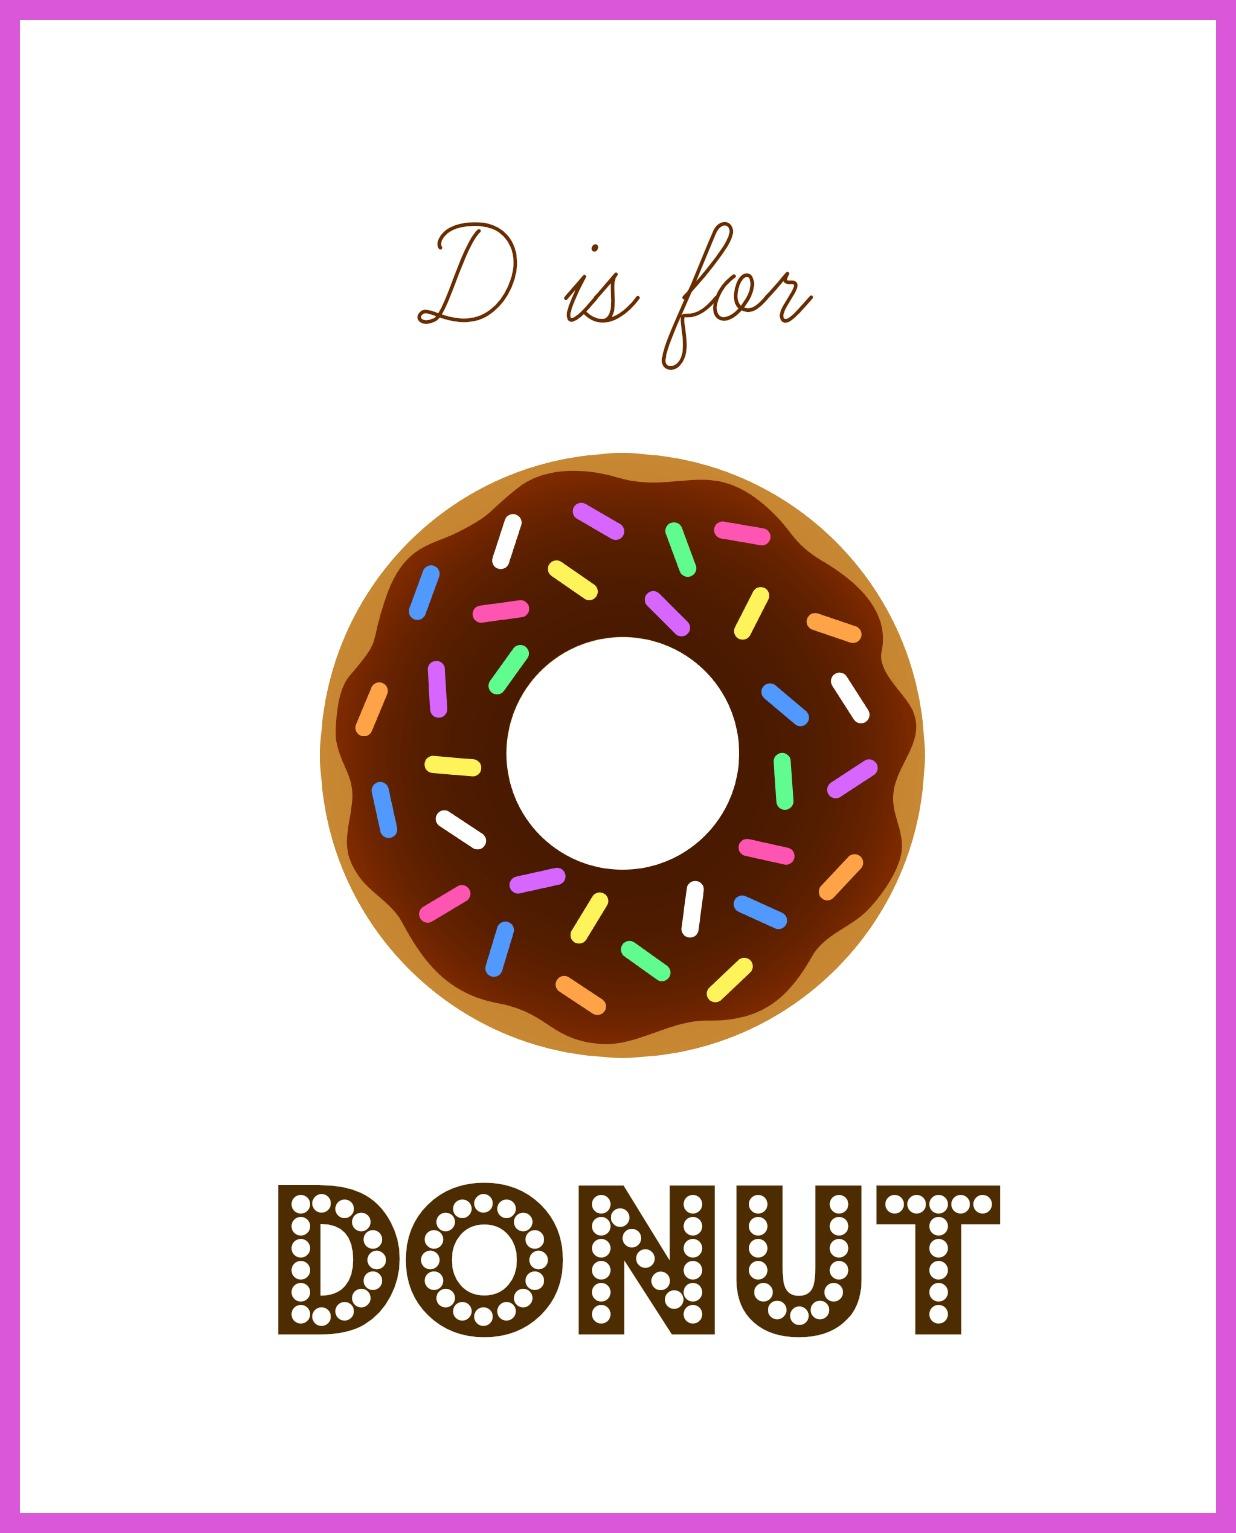 Letter D For Donuts Enchantedyankee